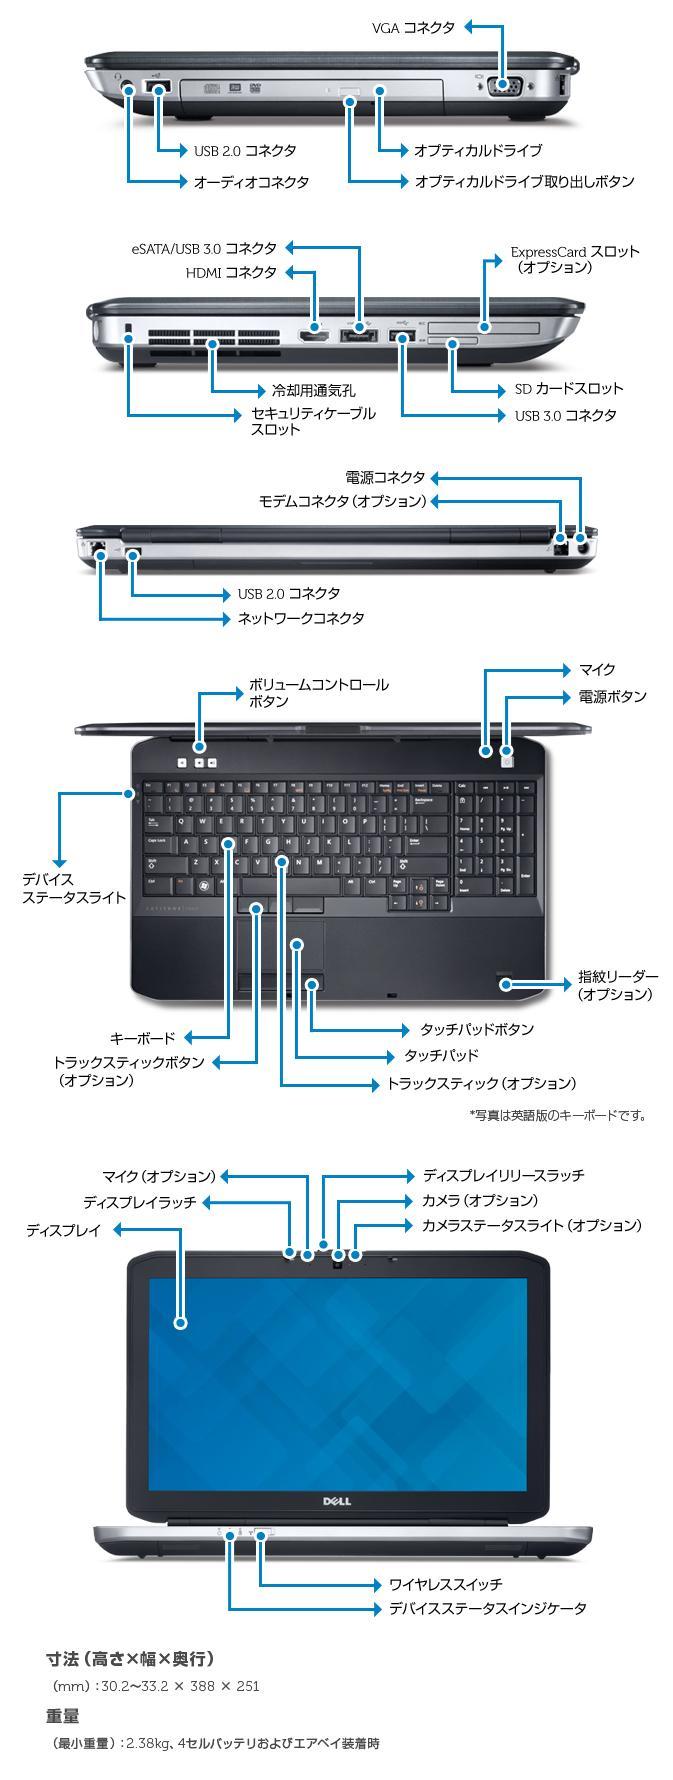 latitude e5530 laptop